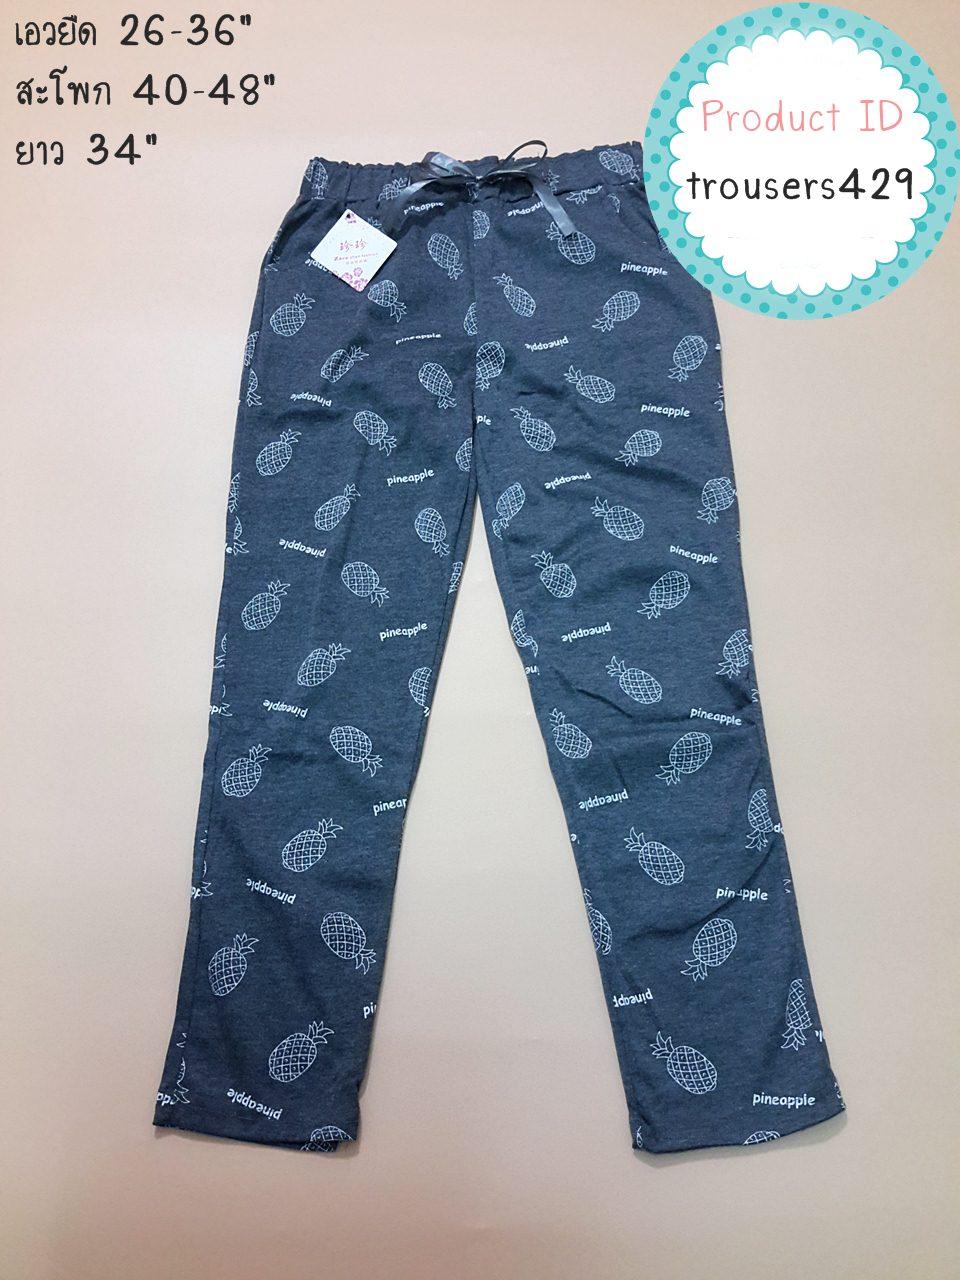 trousers429 กางเกงขายาวเอวยืด กระเป๋าข้าง ผ้าคอตตอนเนื้อนิ่มยืดได้ ลายสับปะรดสีเทา